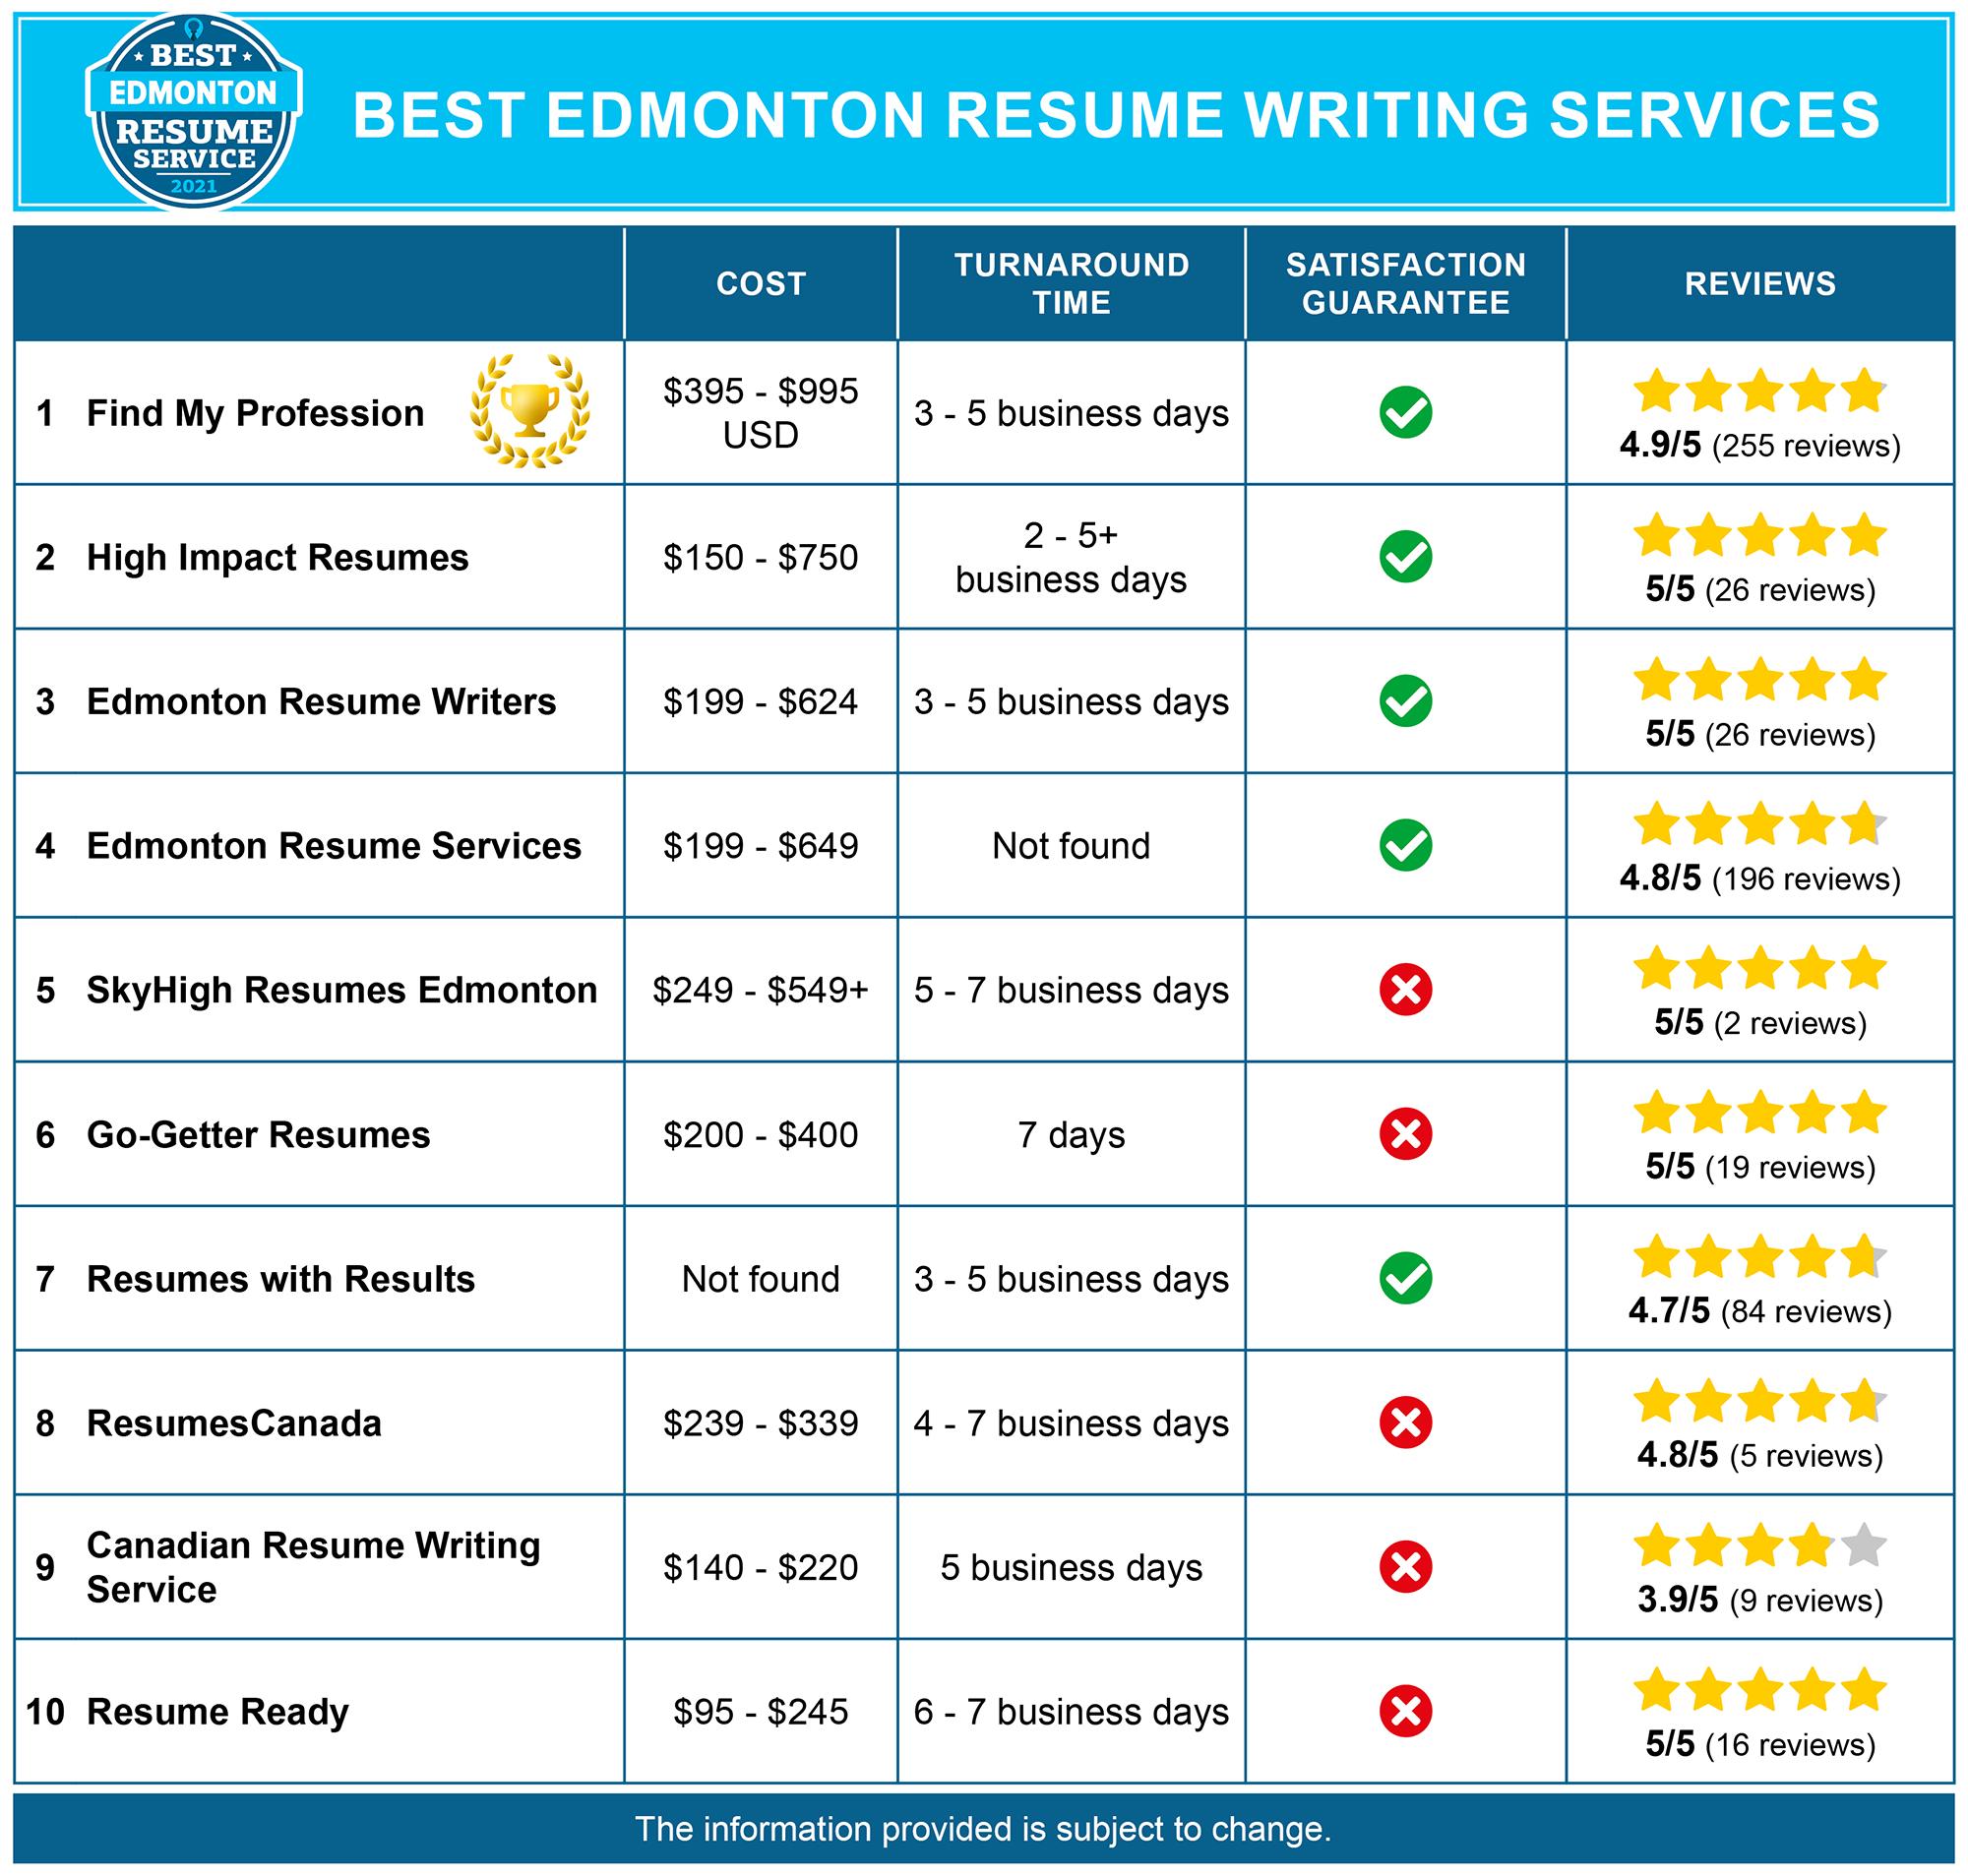 Best Edmonton Resume Services